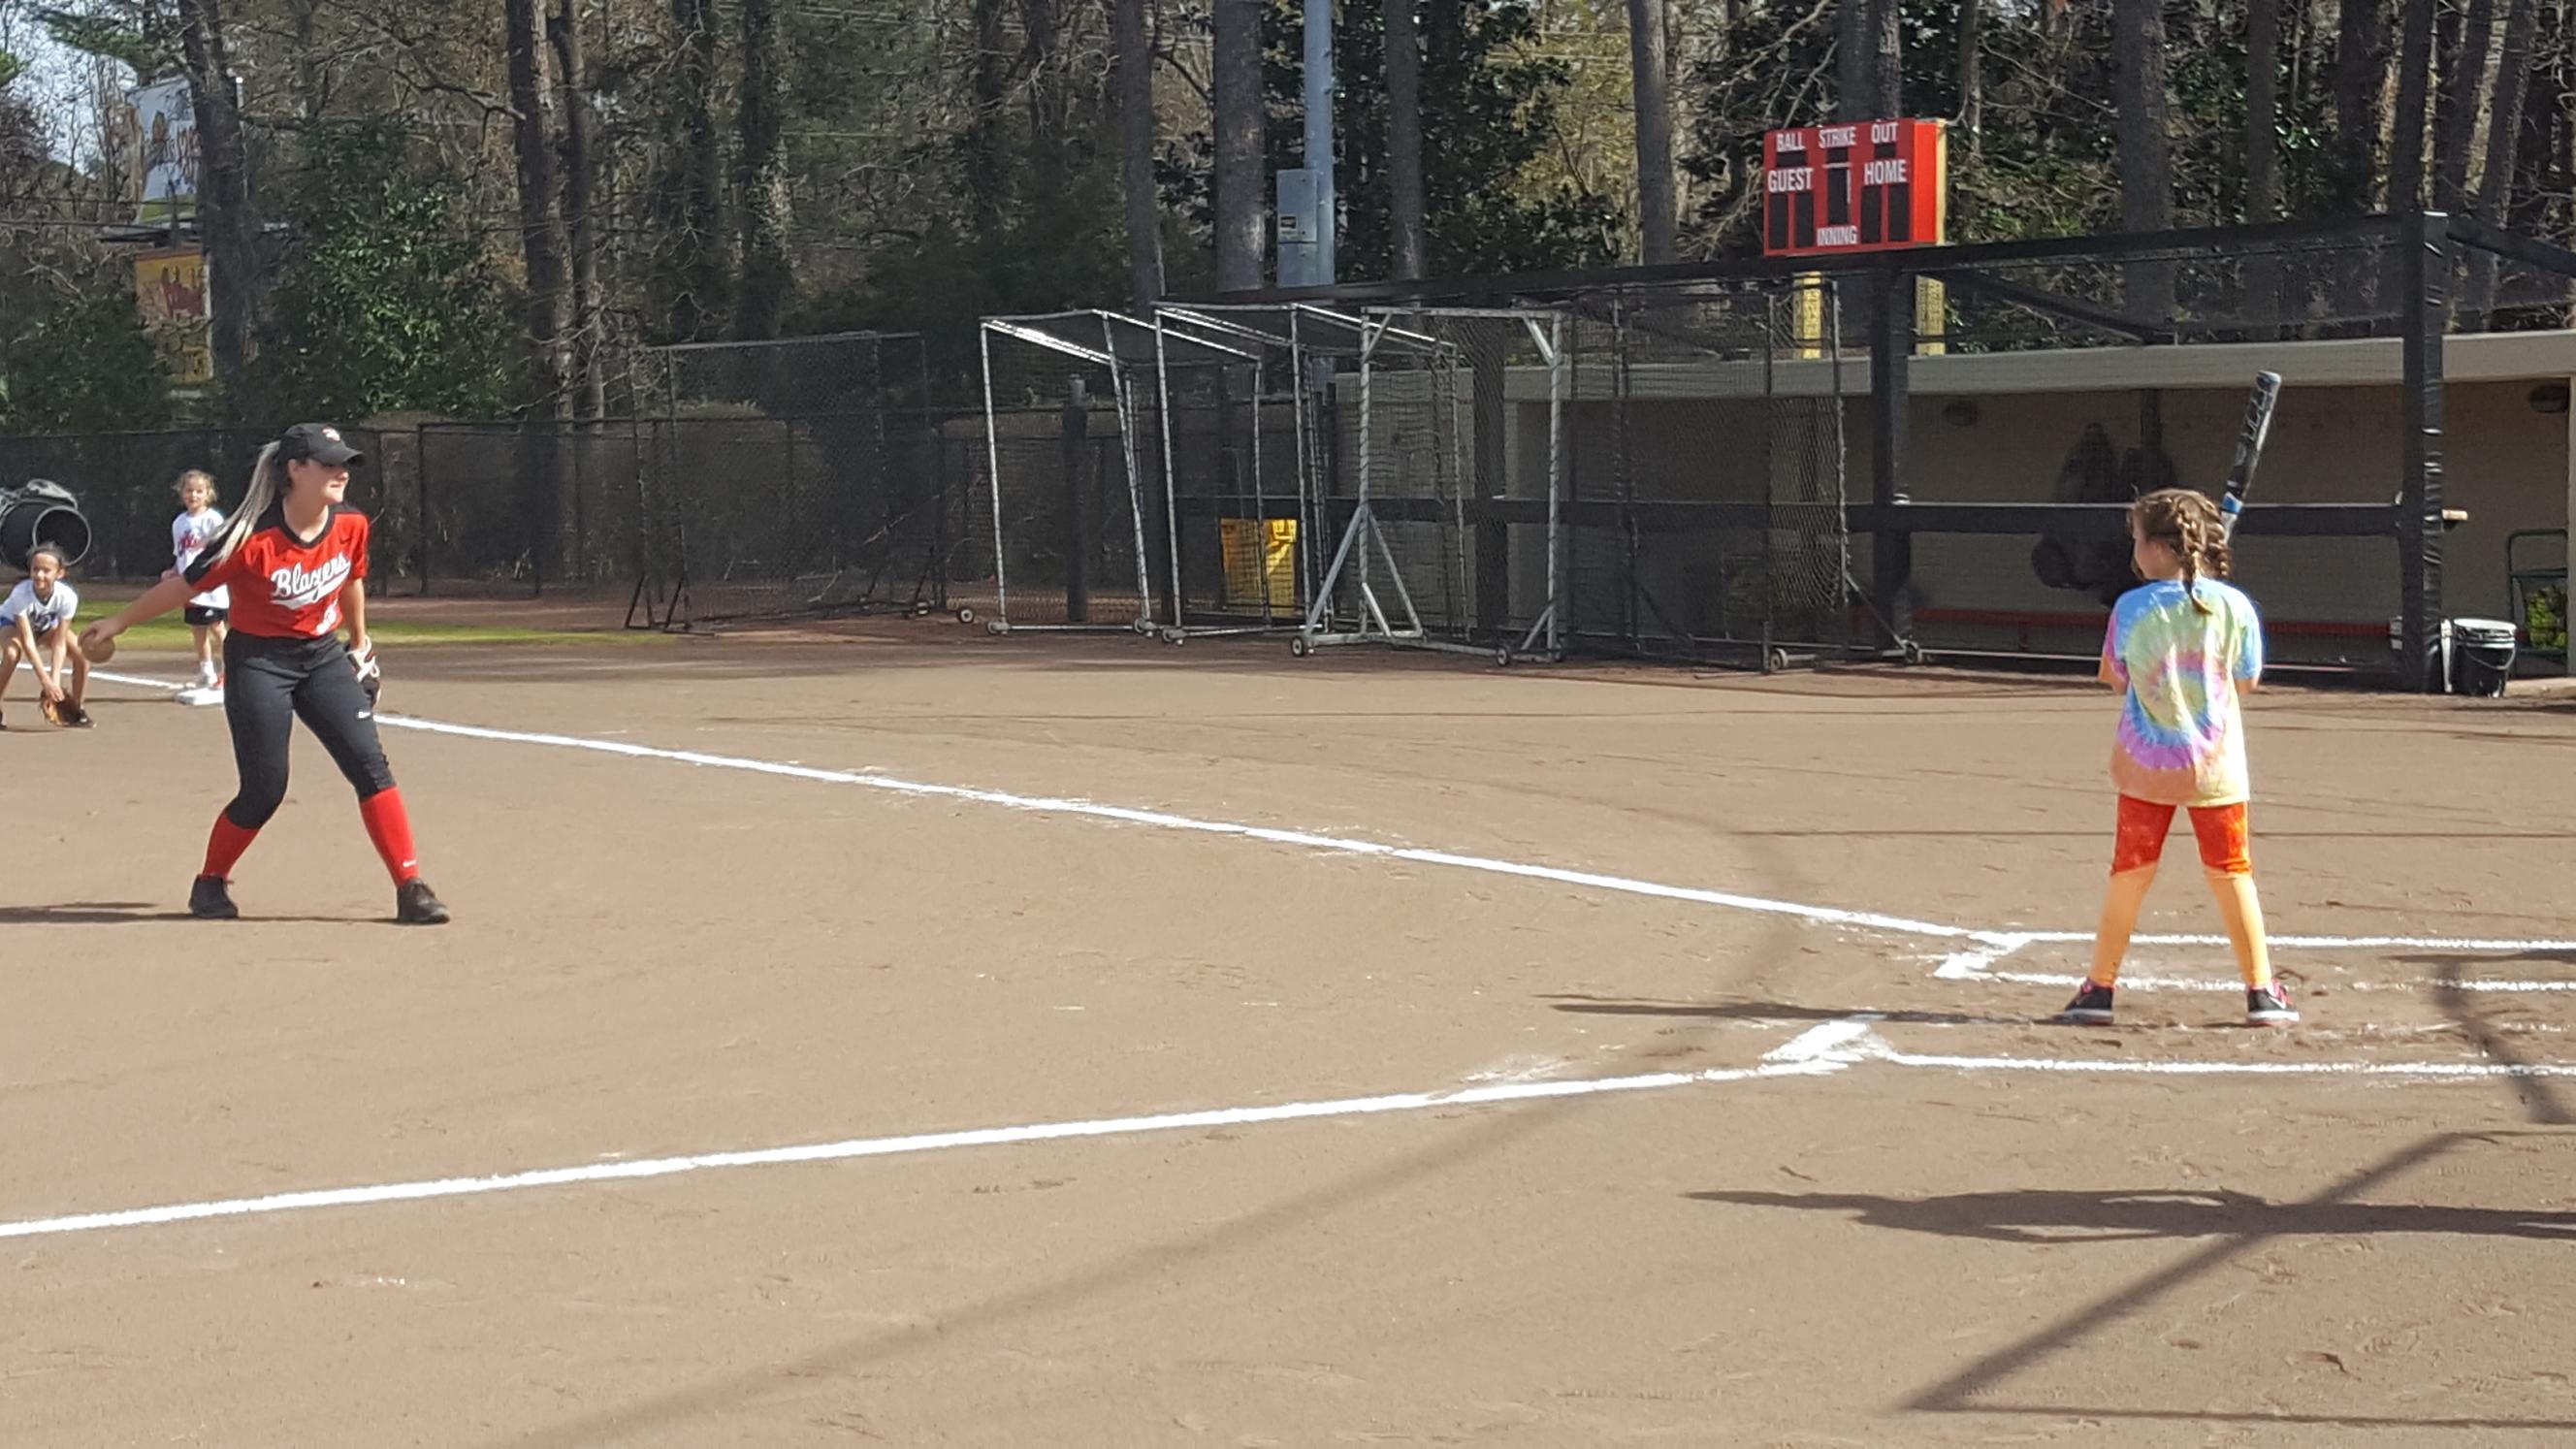 softball pitching to kid